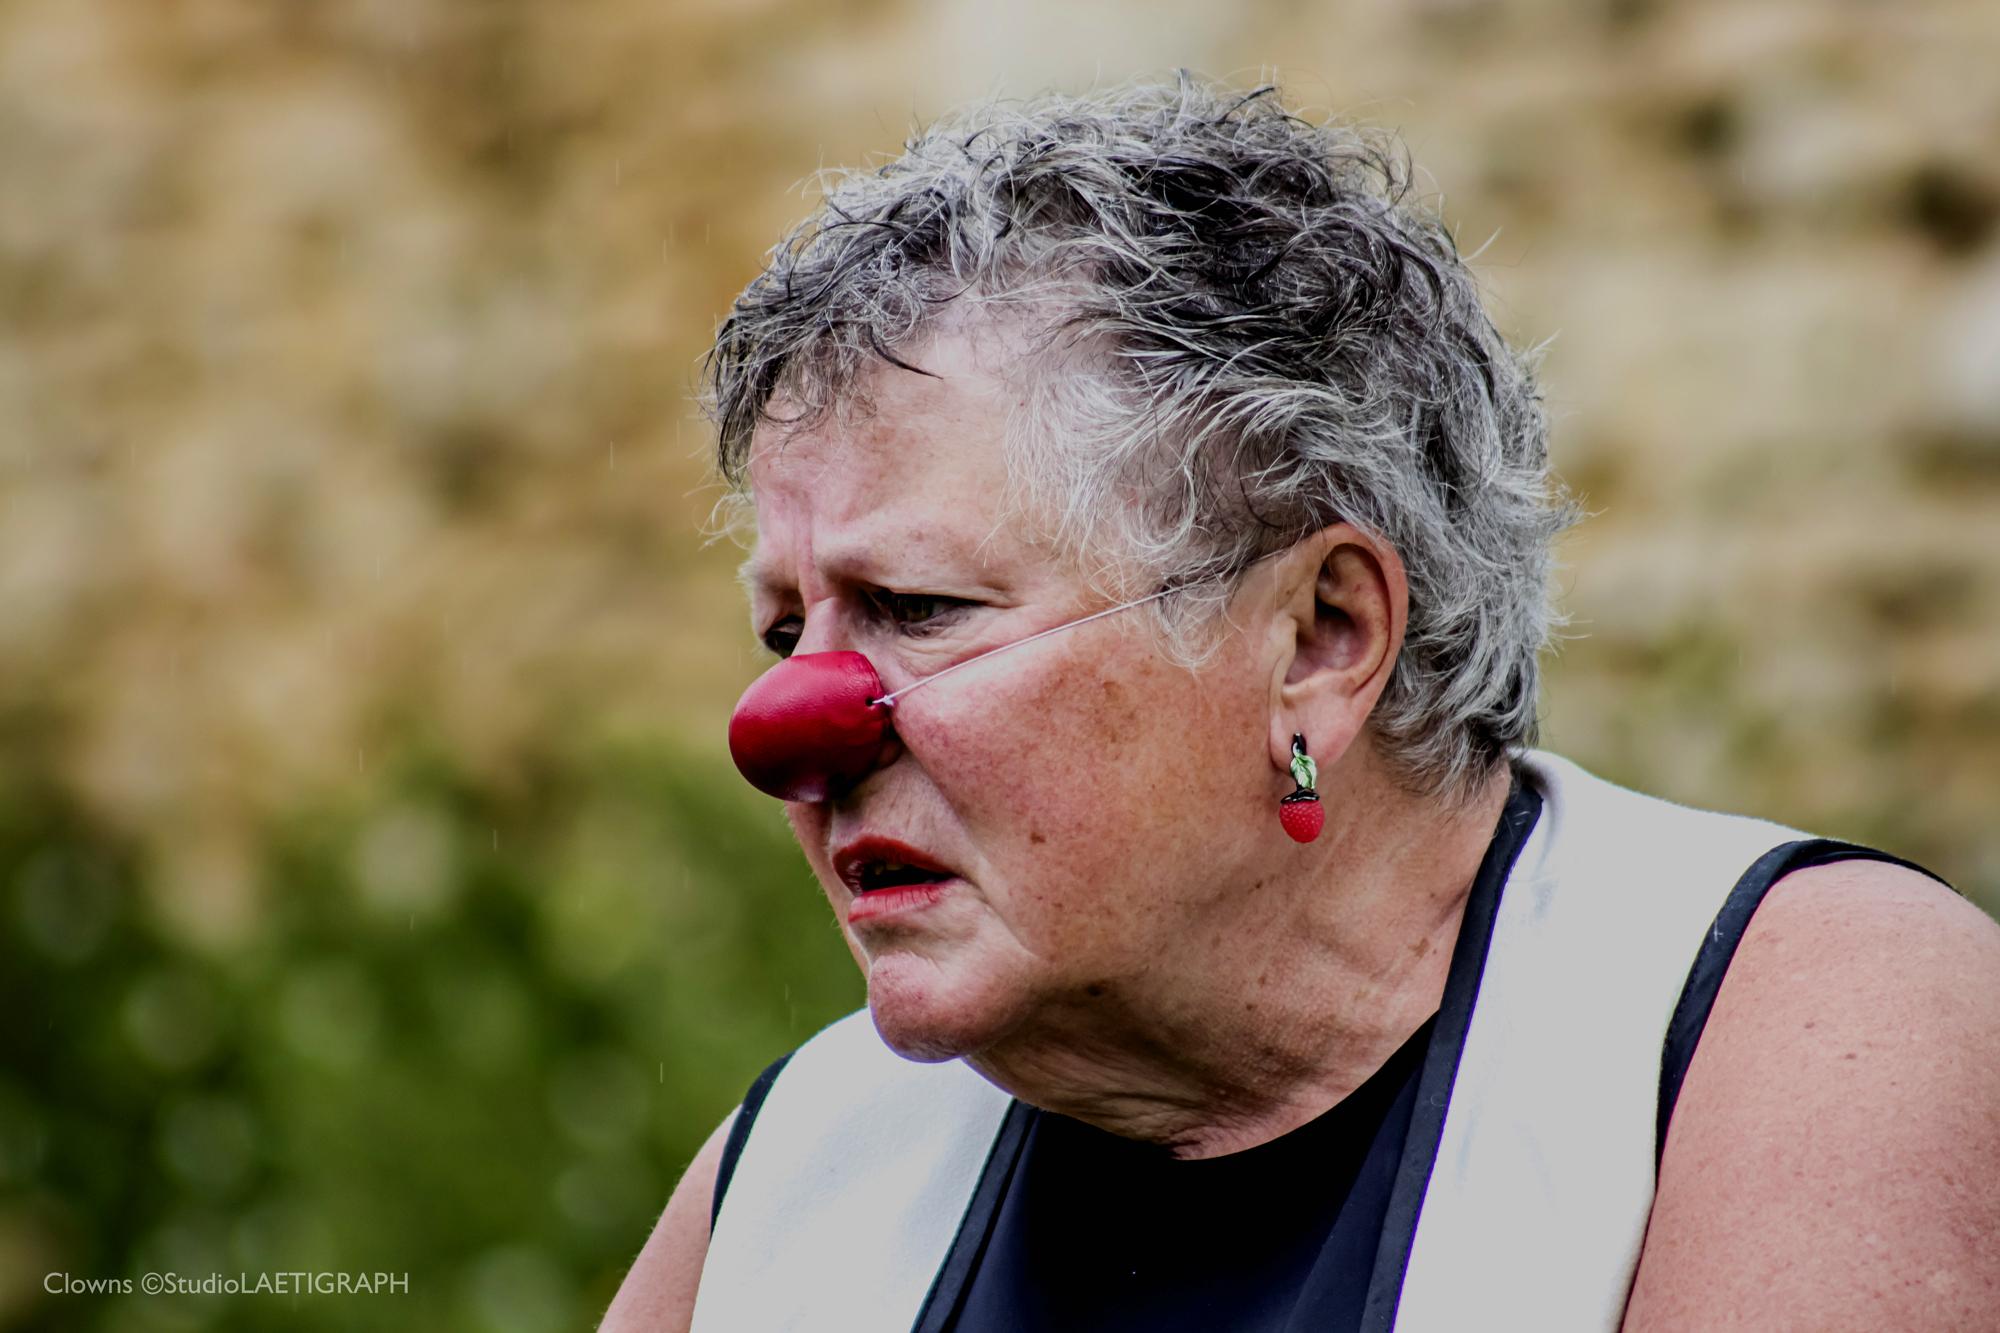 LMDCB21_clowns-51_1